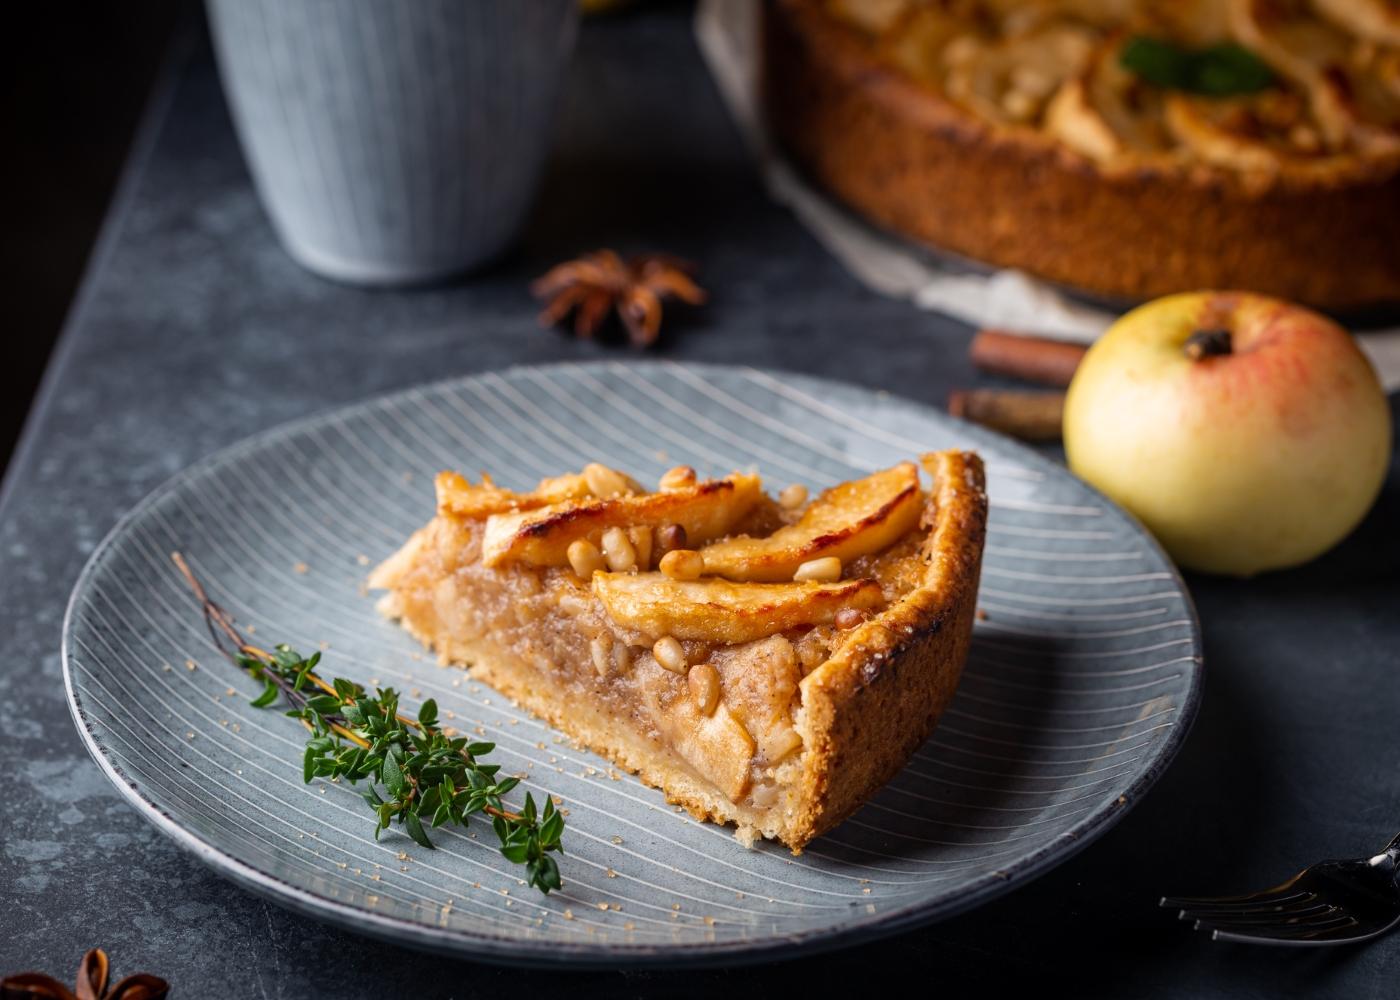 Fatia de tarte de maçã sem glúten e sem lactose servida num prato